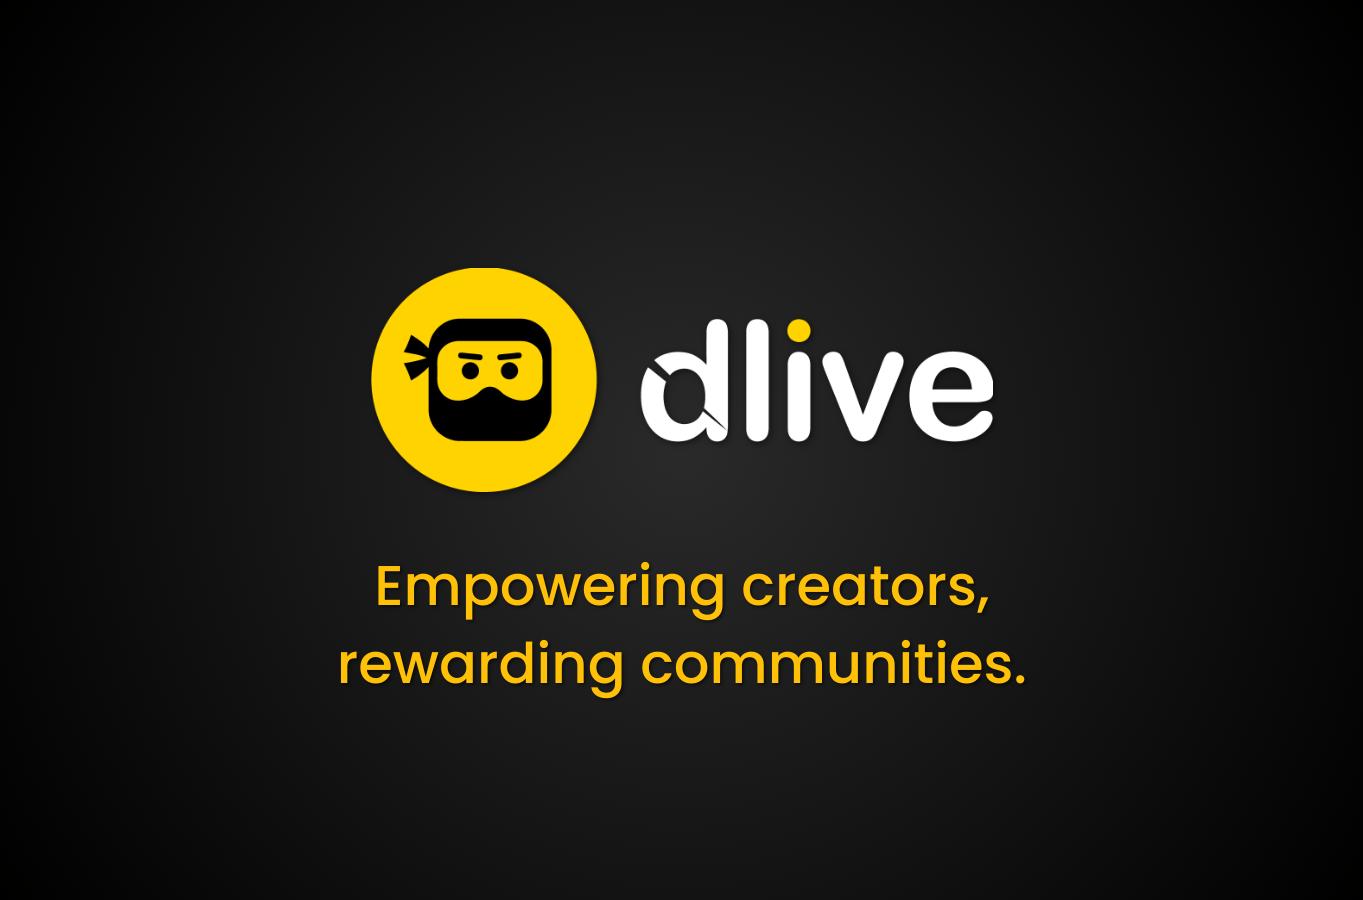 DLive empowering creators, rewarding communities